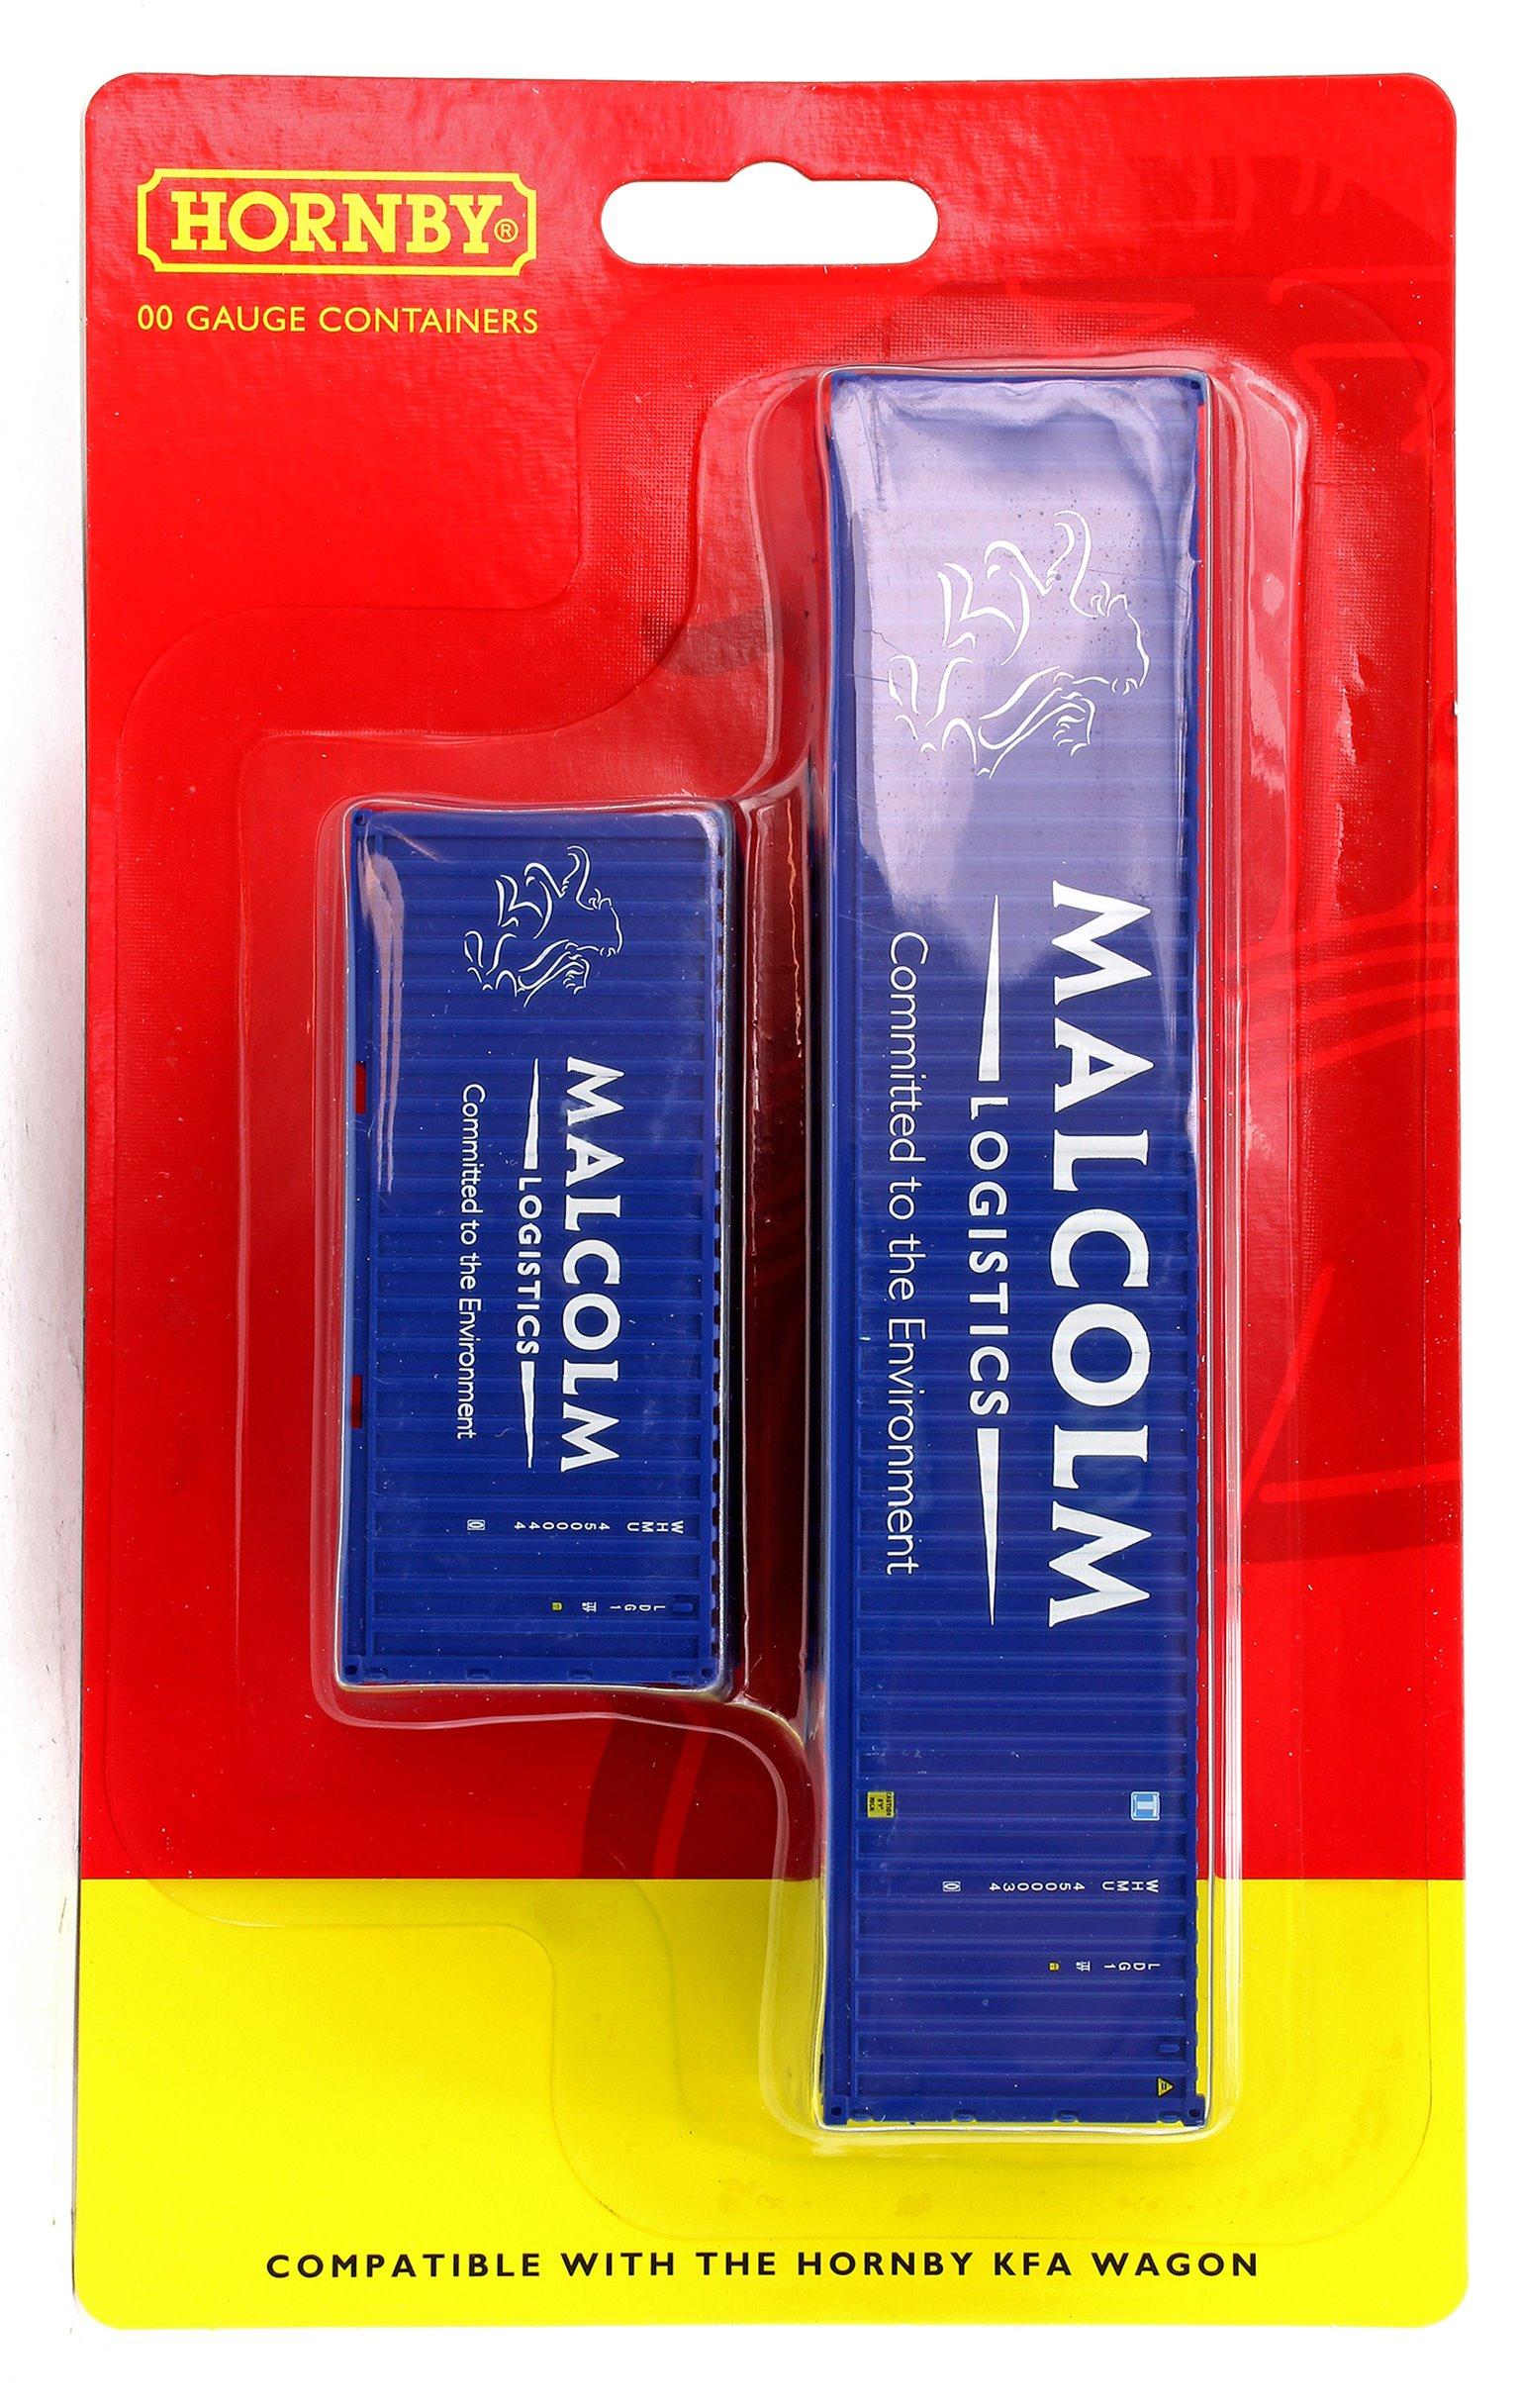 Malcolm Logistics 40ft & 20ft Containers 'WHMU4500034 & WHMU4500044'